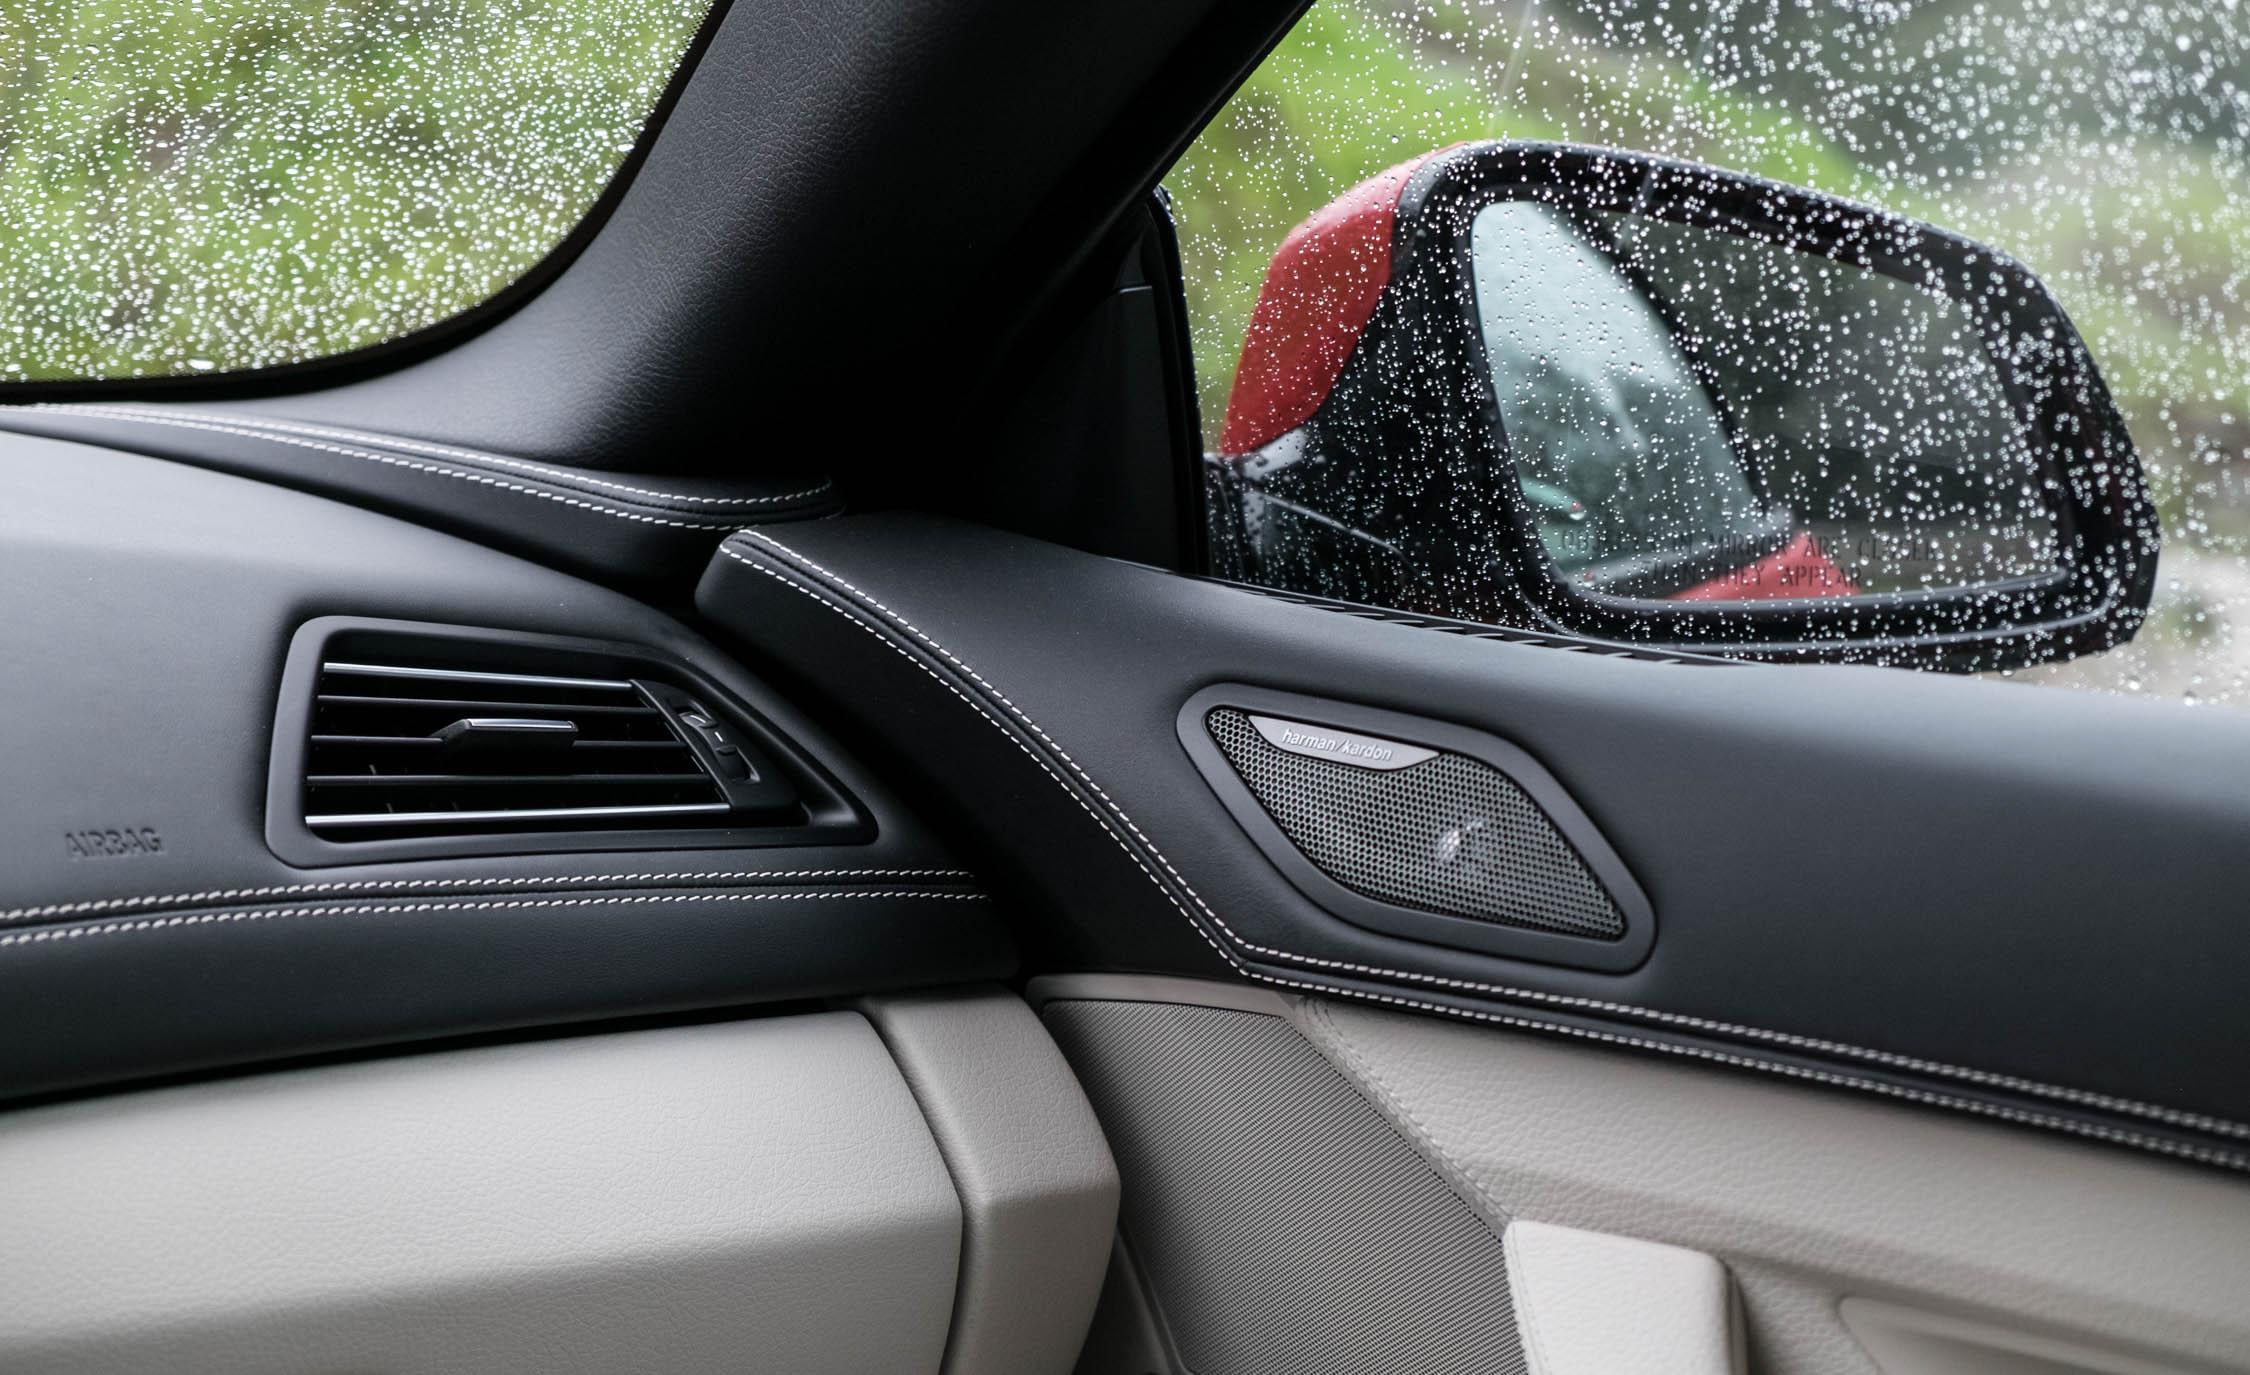 2016 BMW 640i Convertible Interior Tweeter Speaker